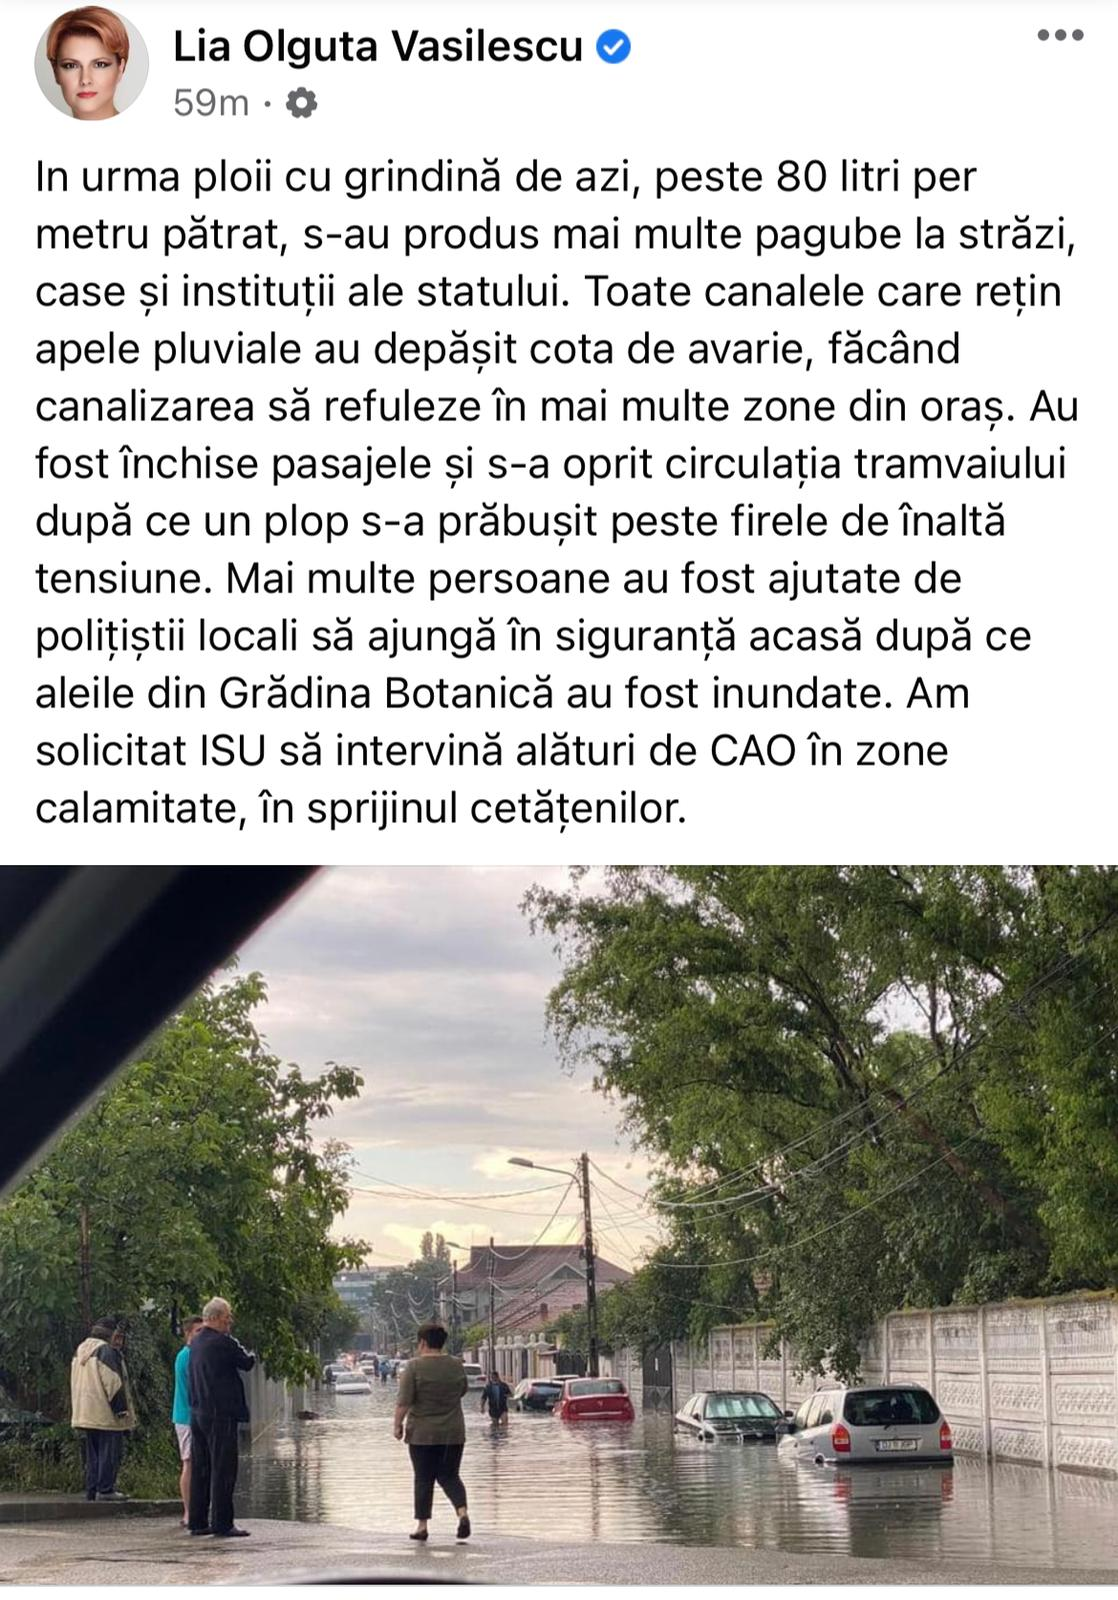 Lia Olguța Vasilescu postare